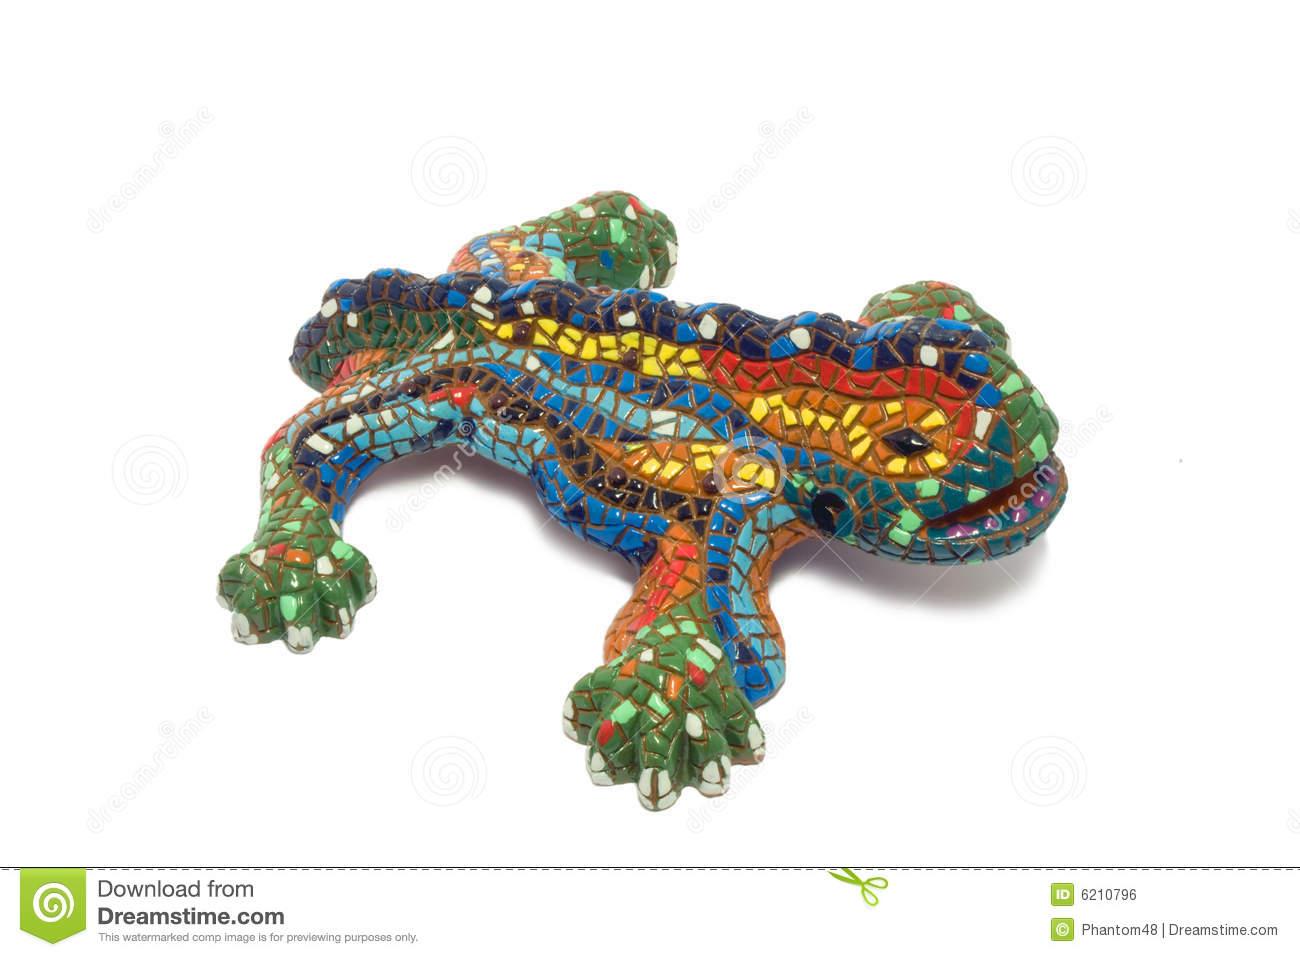 Gaudi's Lizard Barcelona Stock Photos, Images, & Pictures.